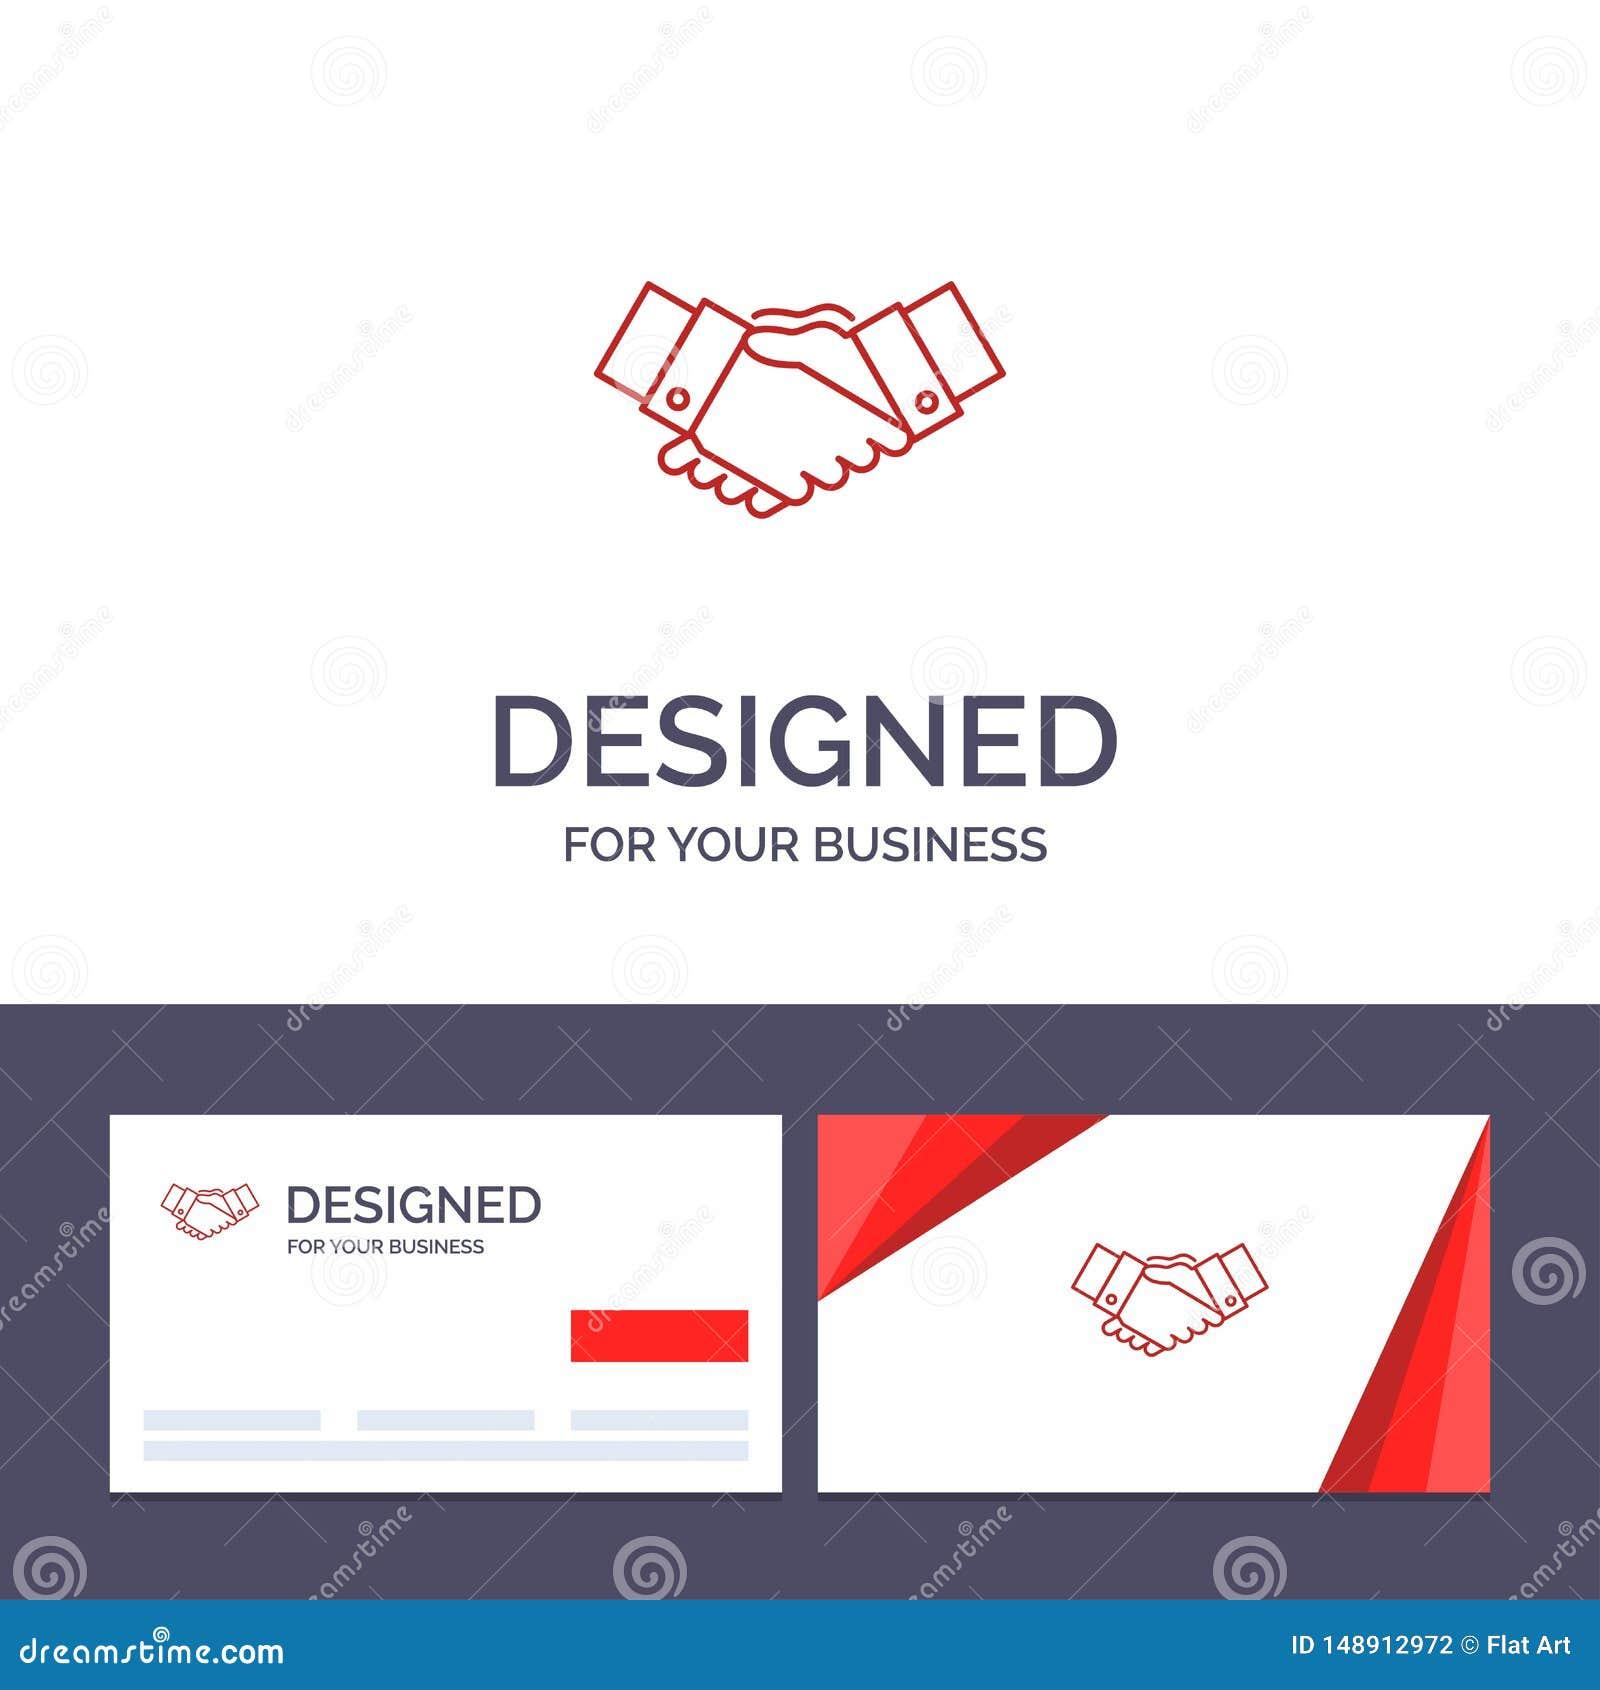 Creative Business Card and Logo template Handshake, Agreement, Business, Hands, Partners, Partnership Vector Illustration